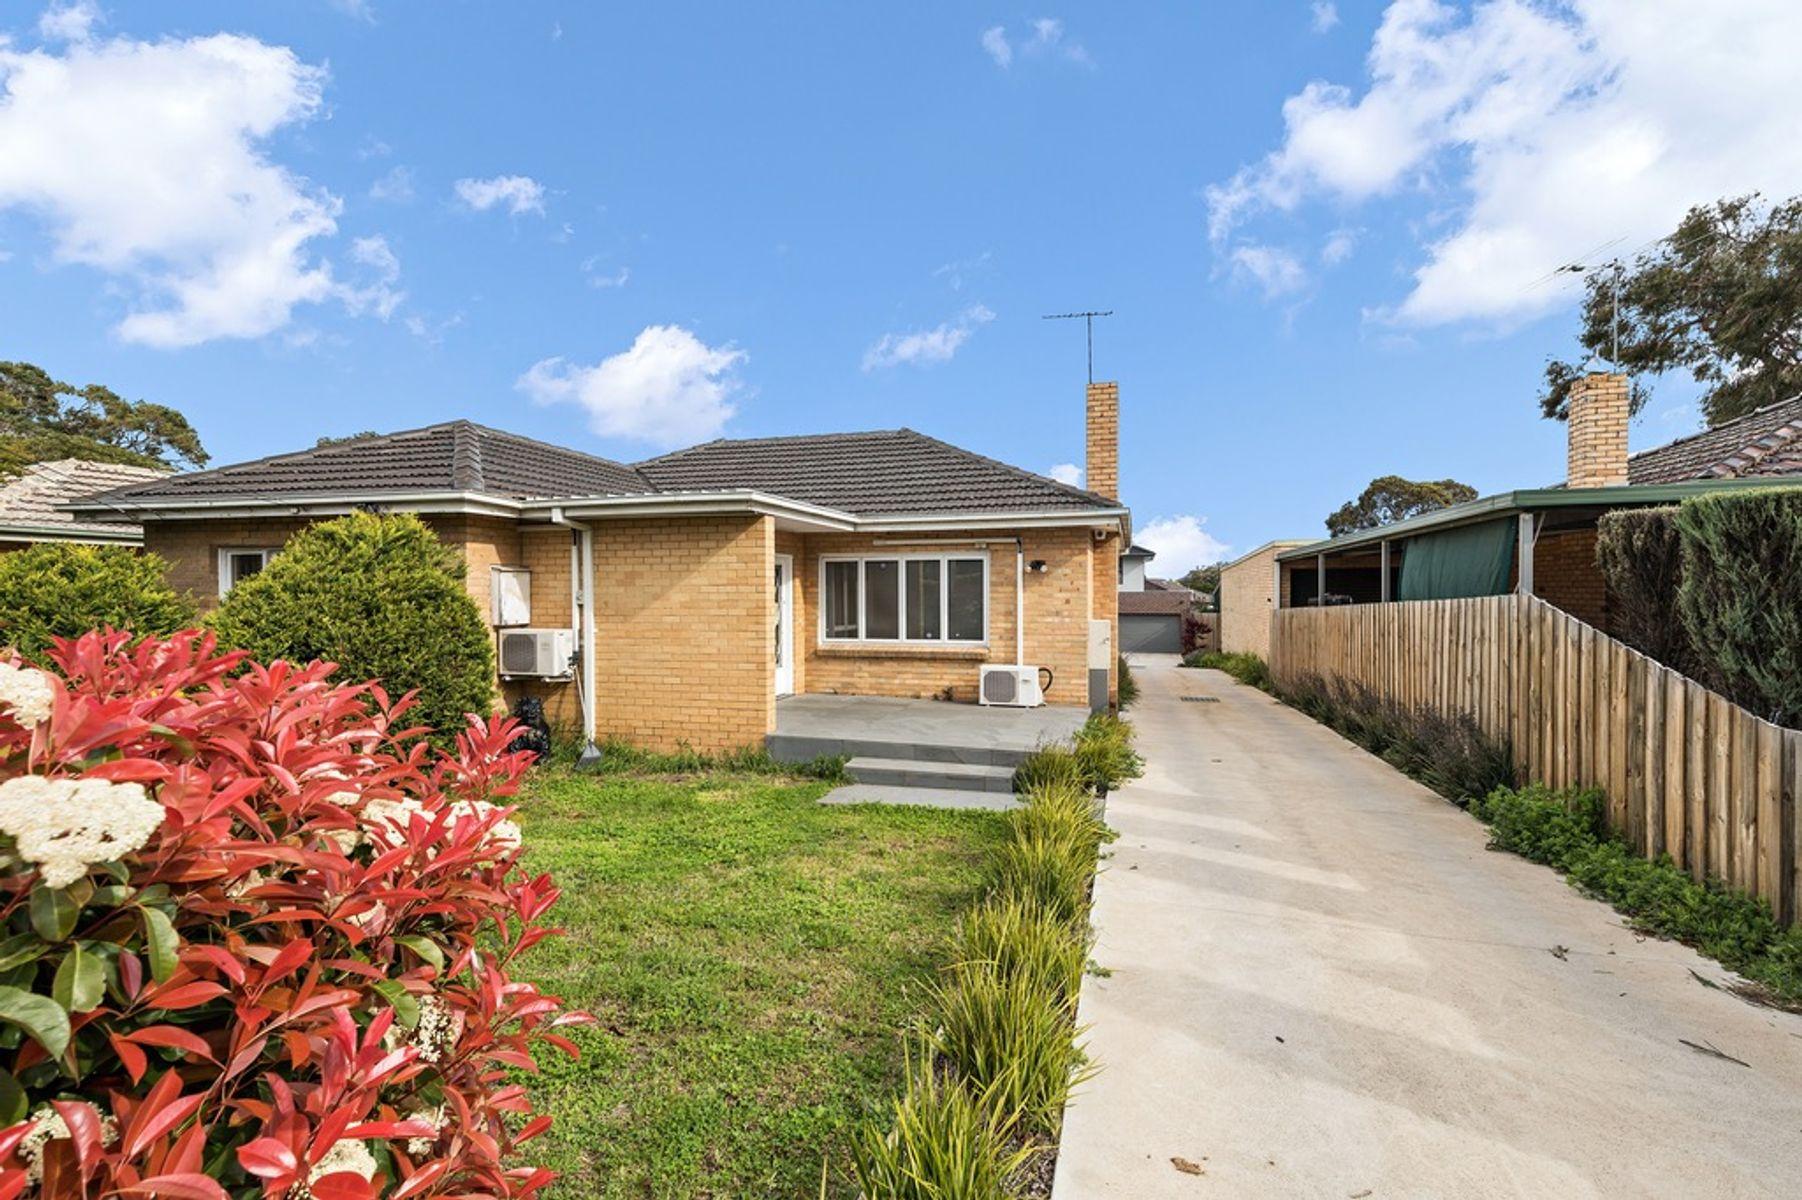 8 Adelaide Avenue, Mount Waverley, VIC 3149